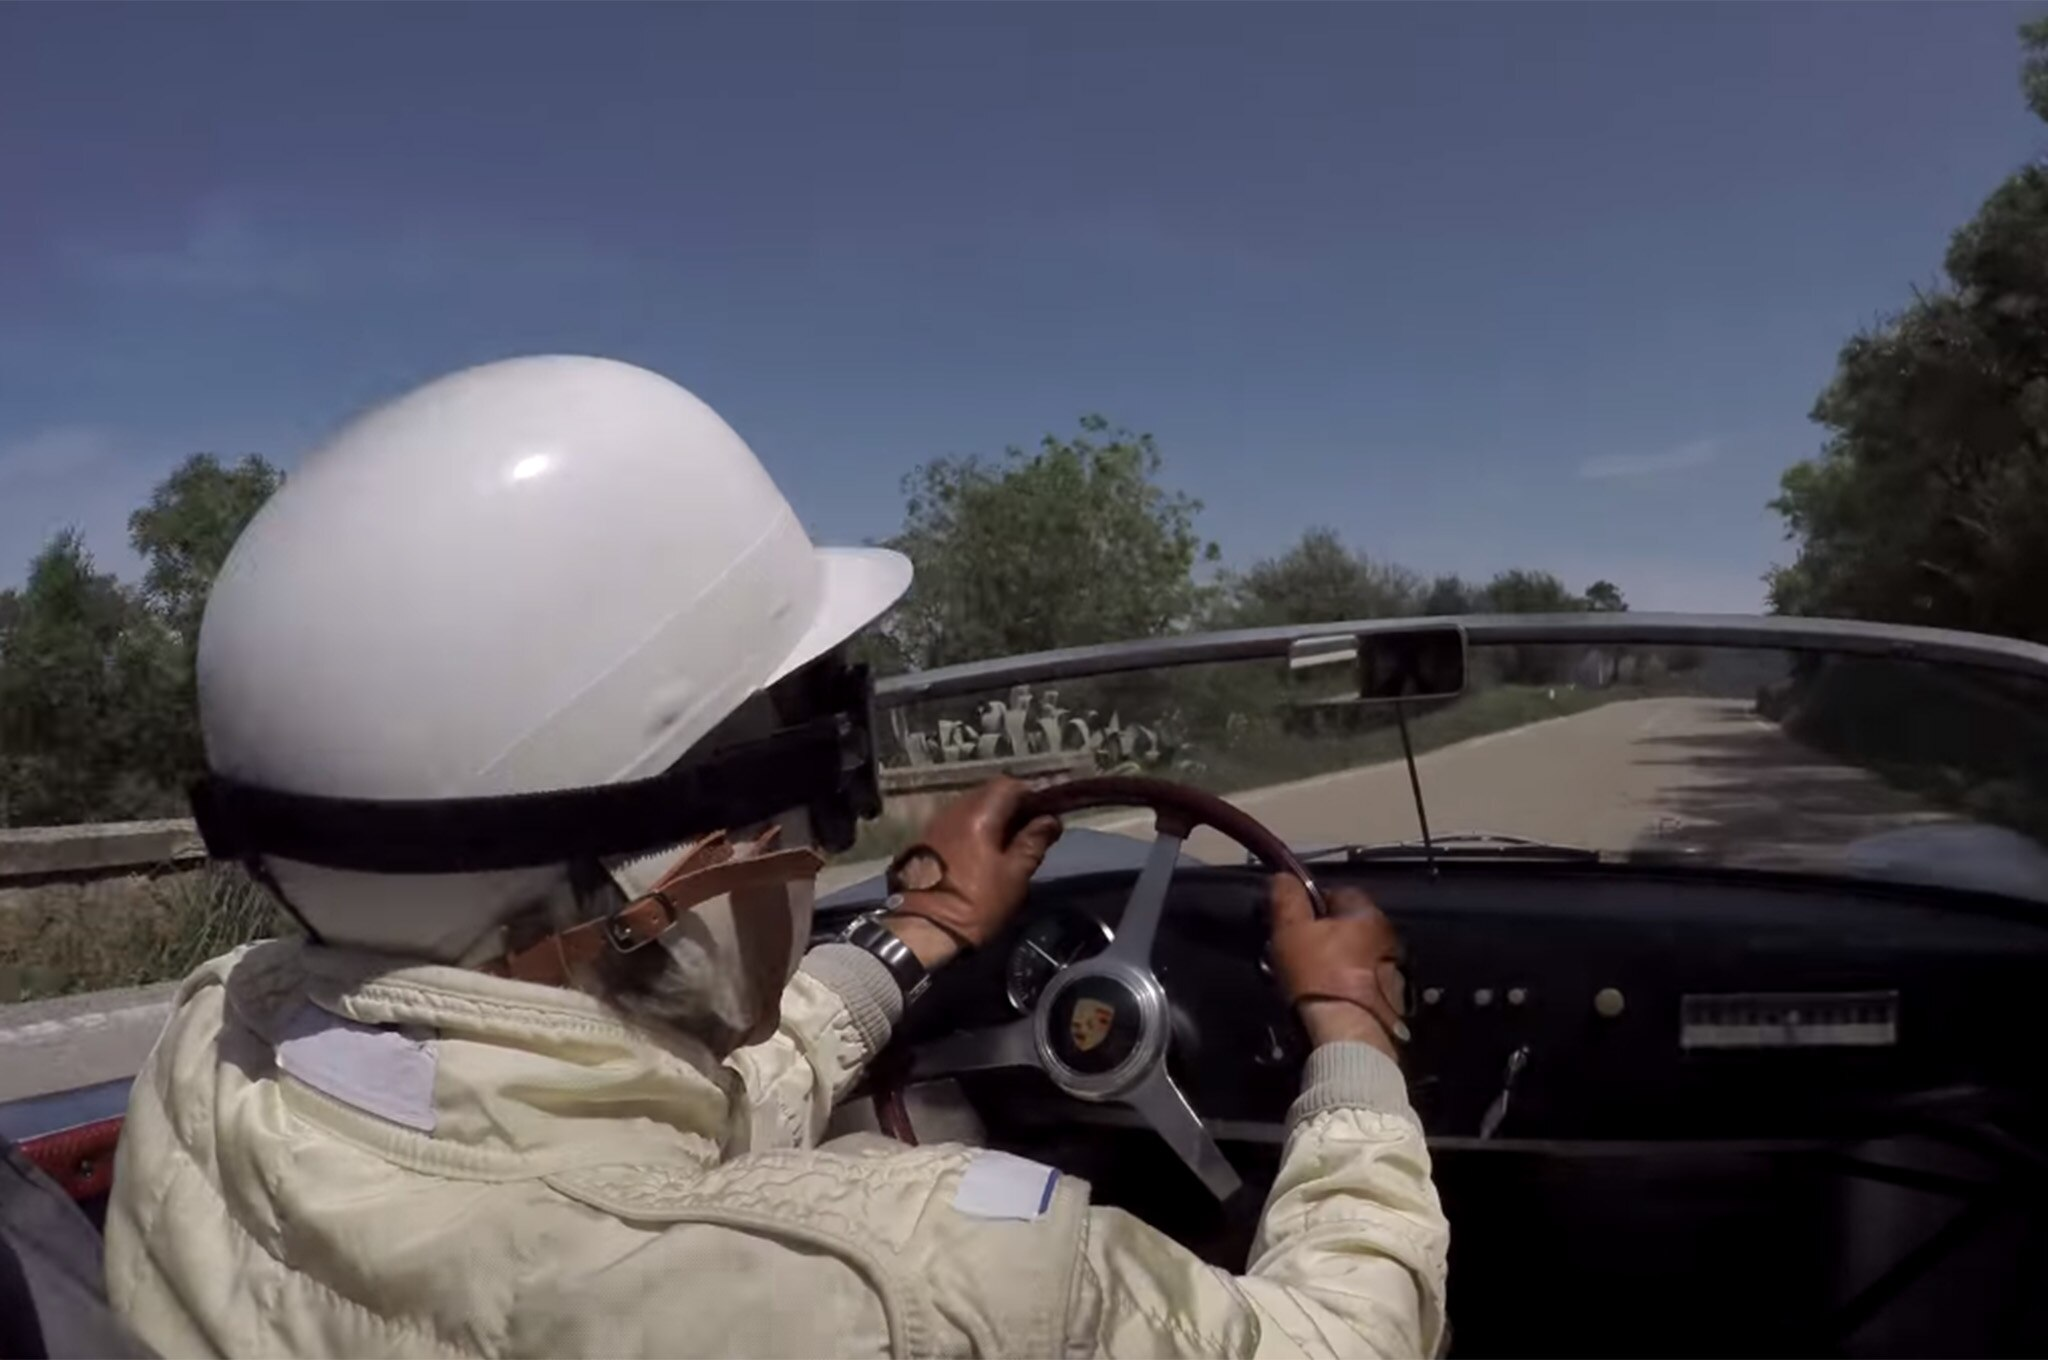 Derek Bell 718 RS60 Targa Florio Screencap